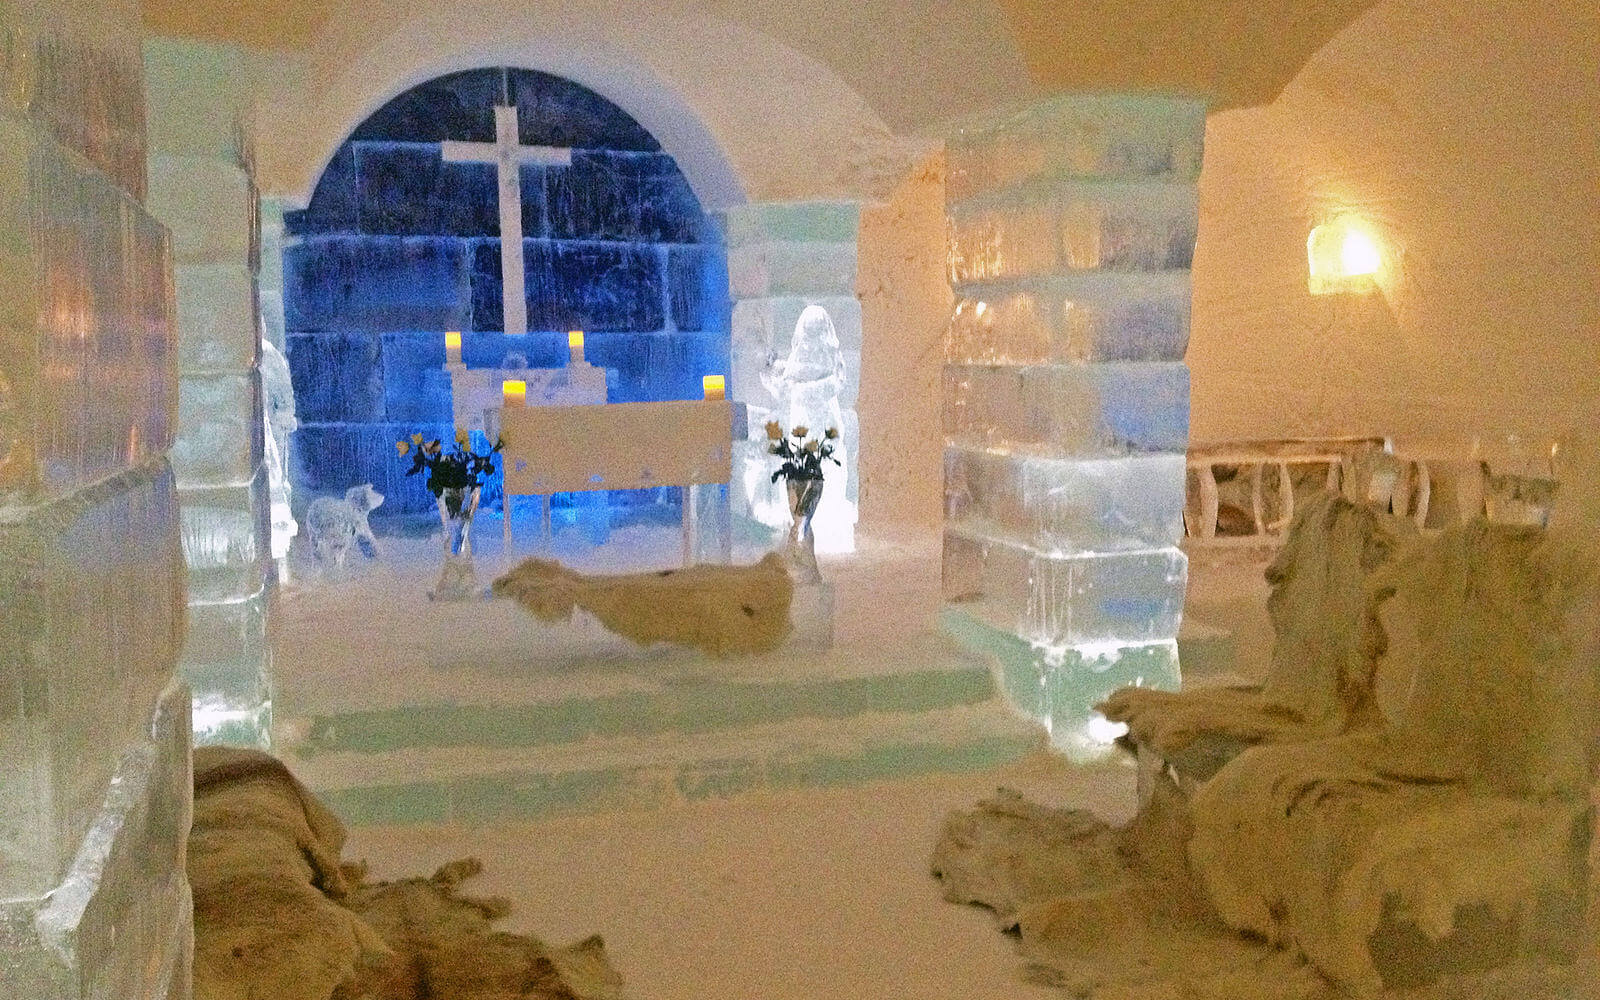 Iglu Hotel in Norwegen von kjelljoran (2)